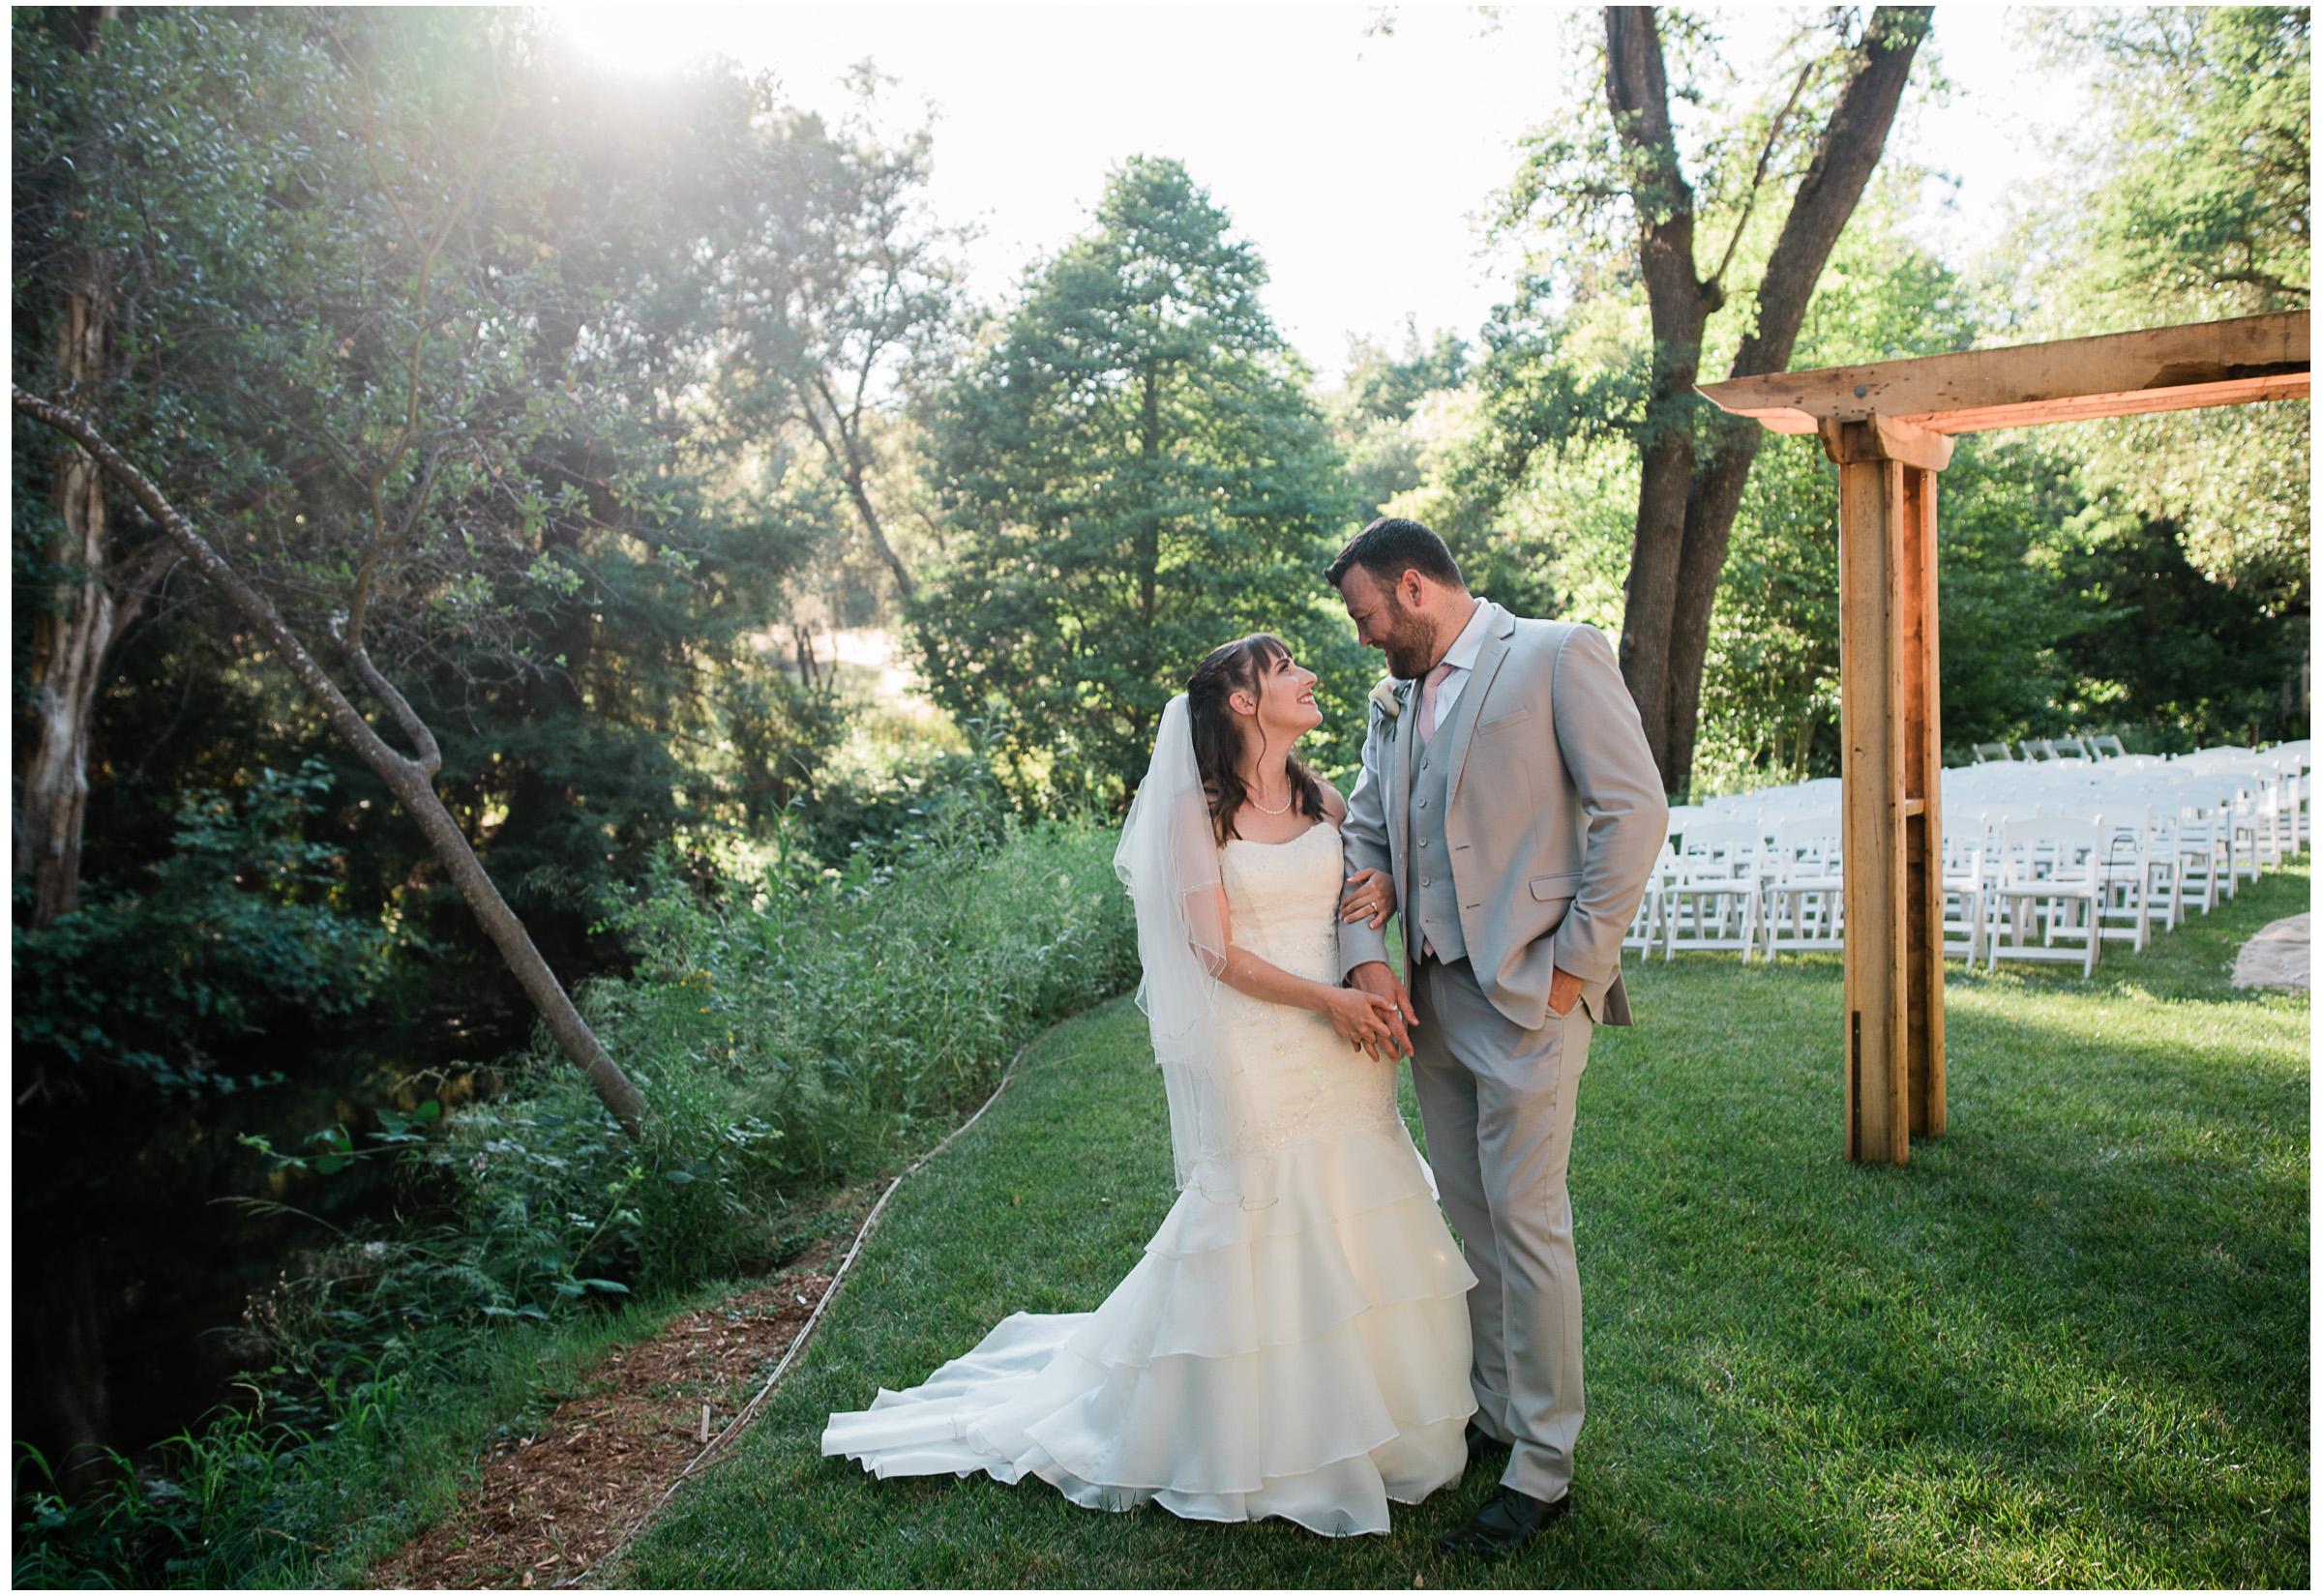 Placerville Wedding - Sacramento Photographer - Justin Wilcox Photography - 16.jpg